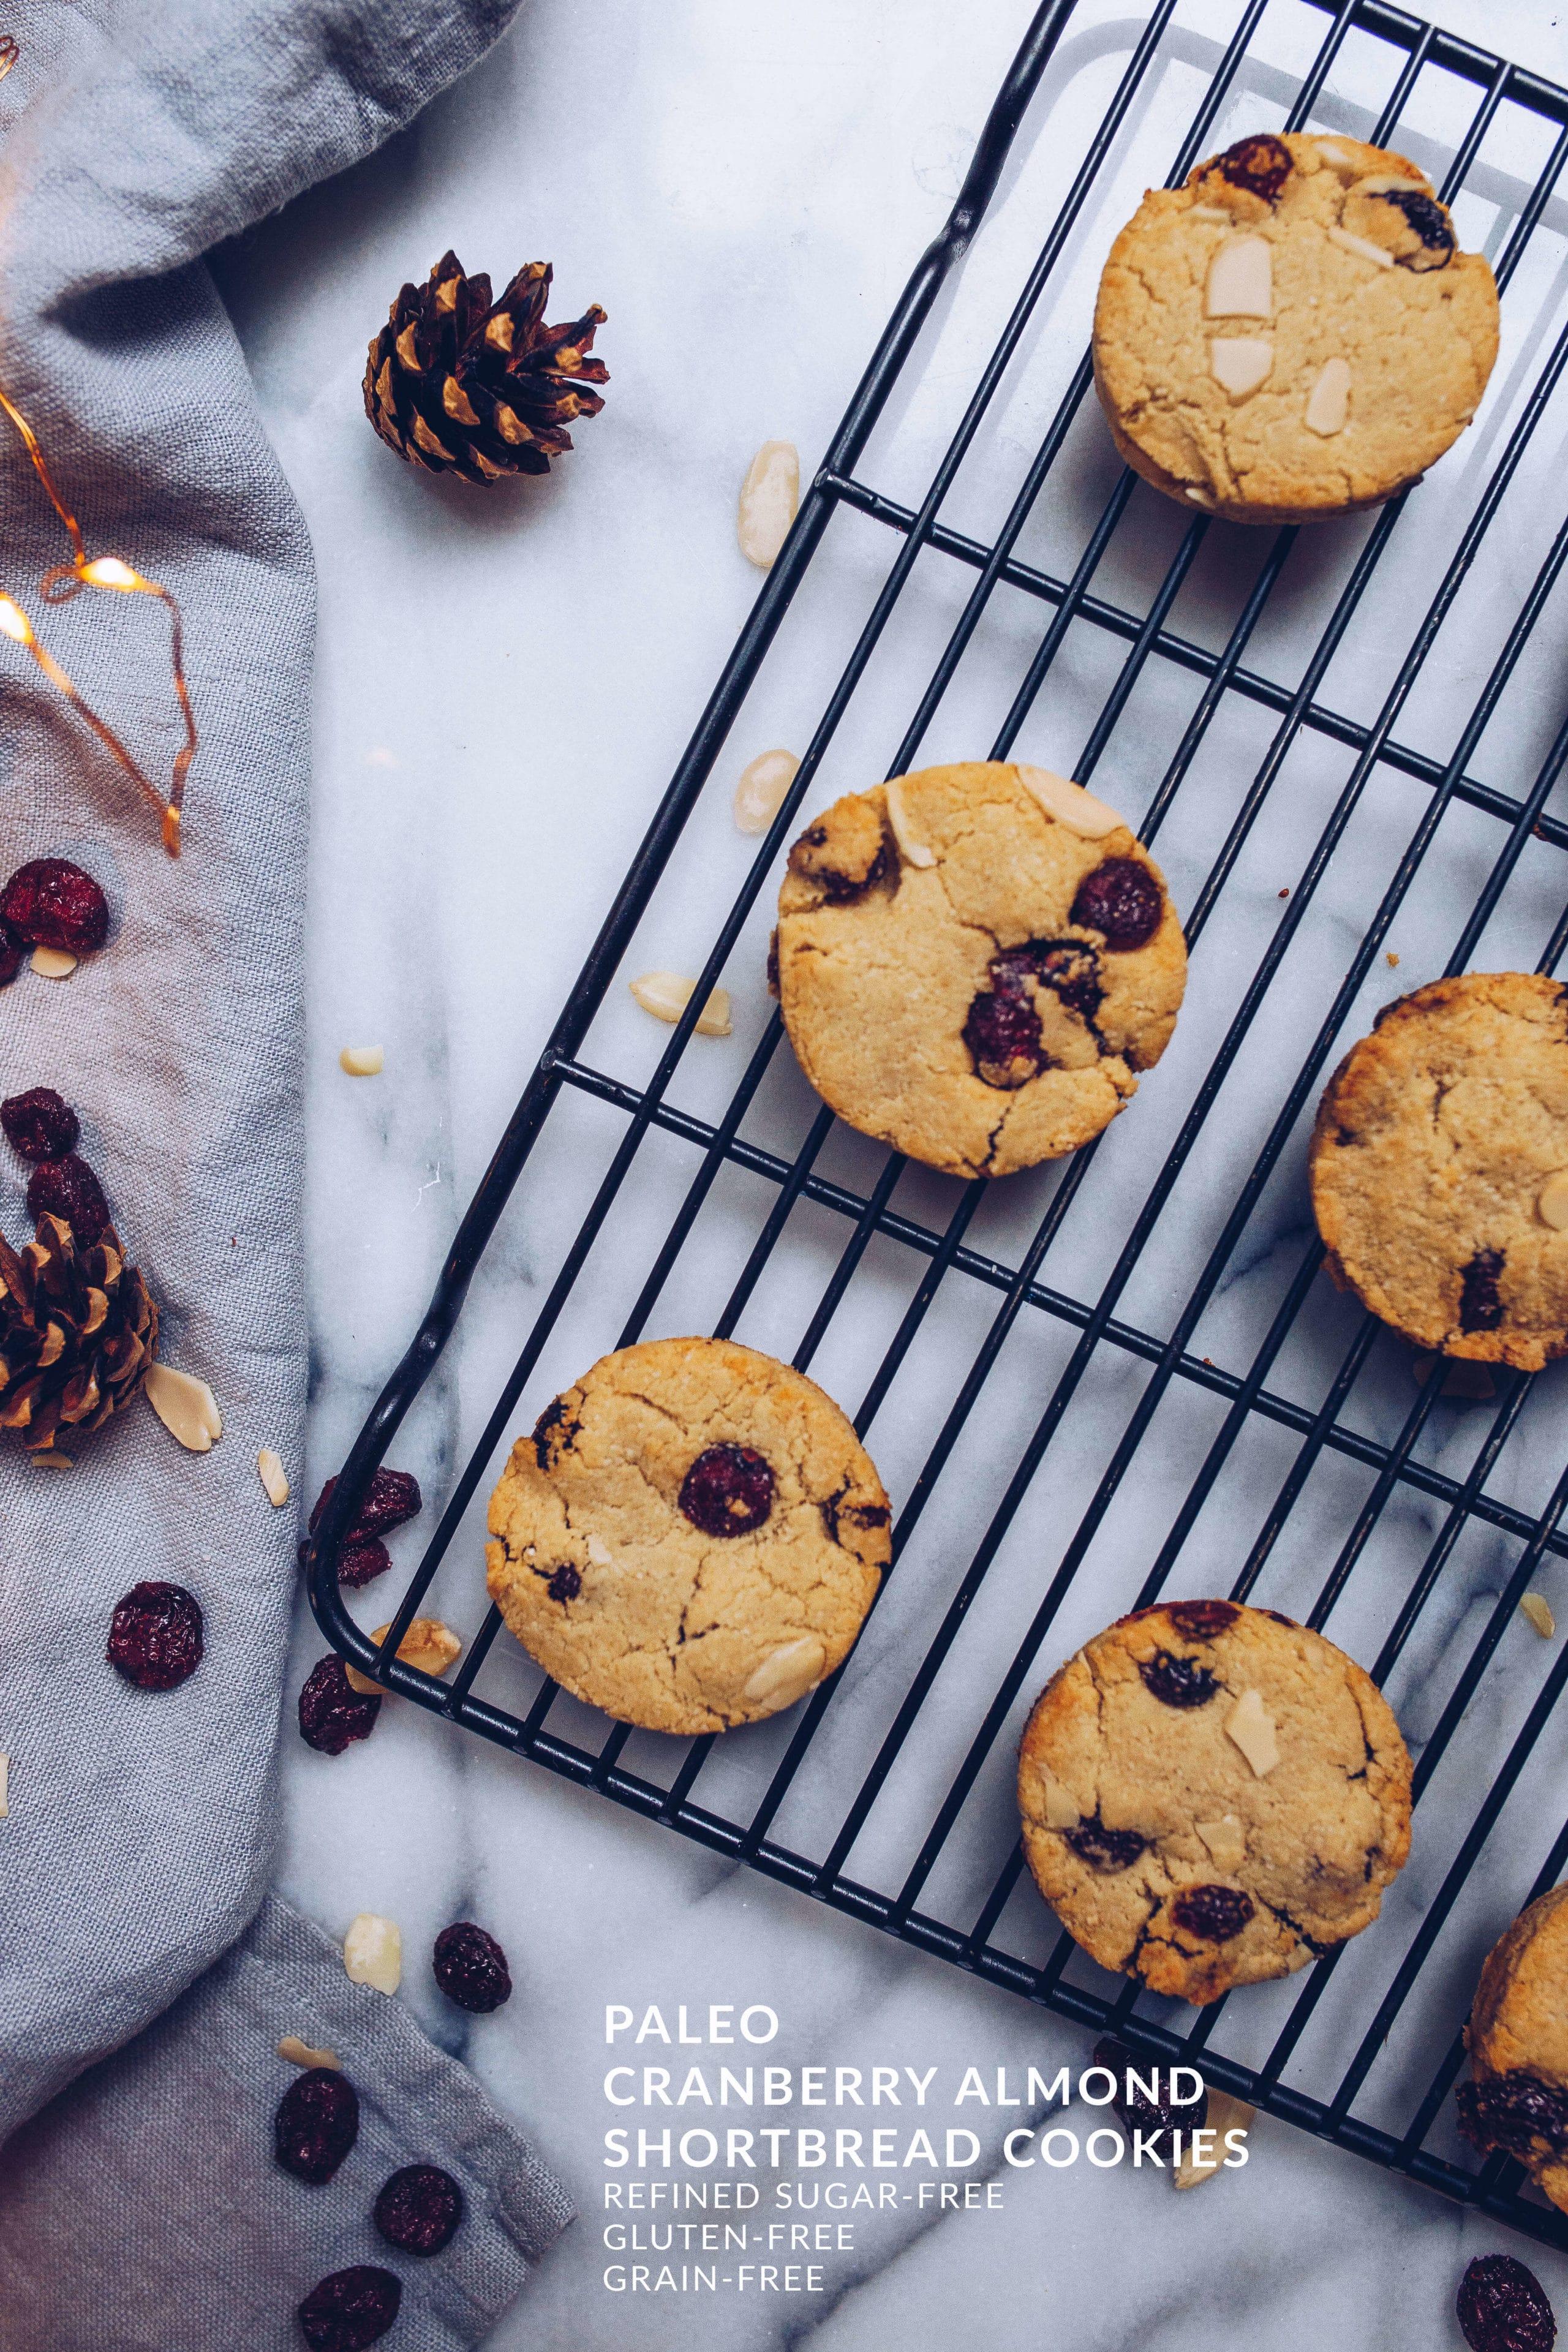 Paleo Cranberry Almond Shortbread Cookies via Food by Mars (gluten-free, grain-free, refined sugar-free)